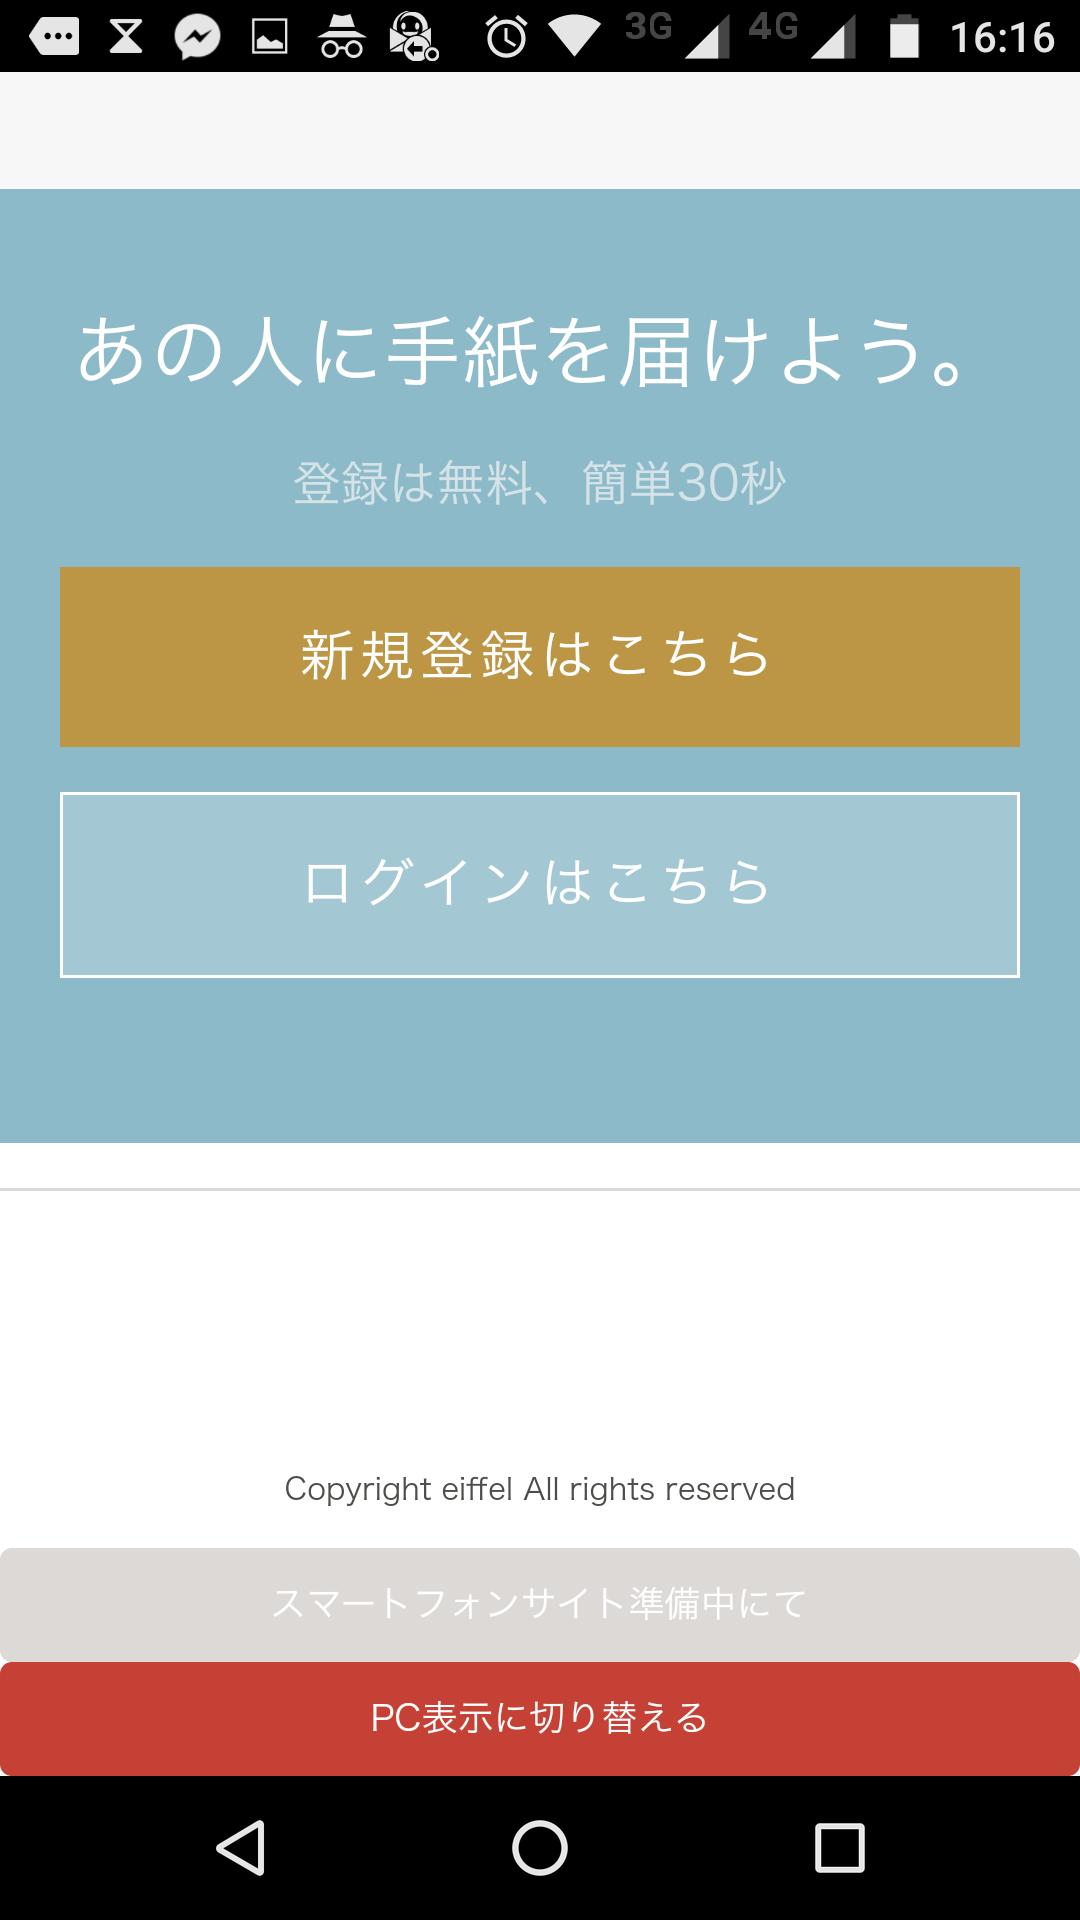 screenshot_20161219-161636